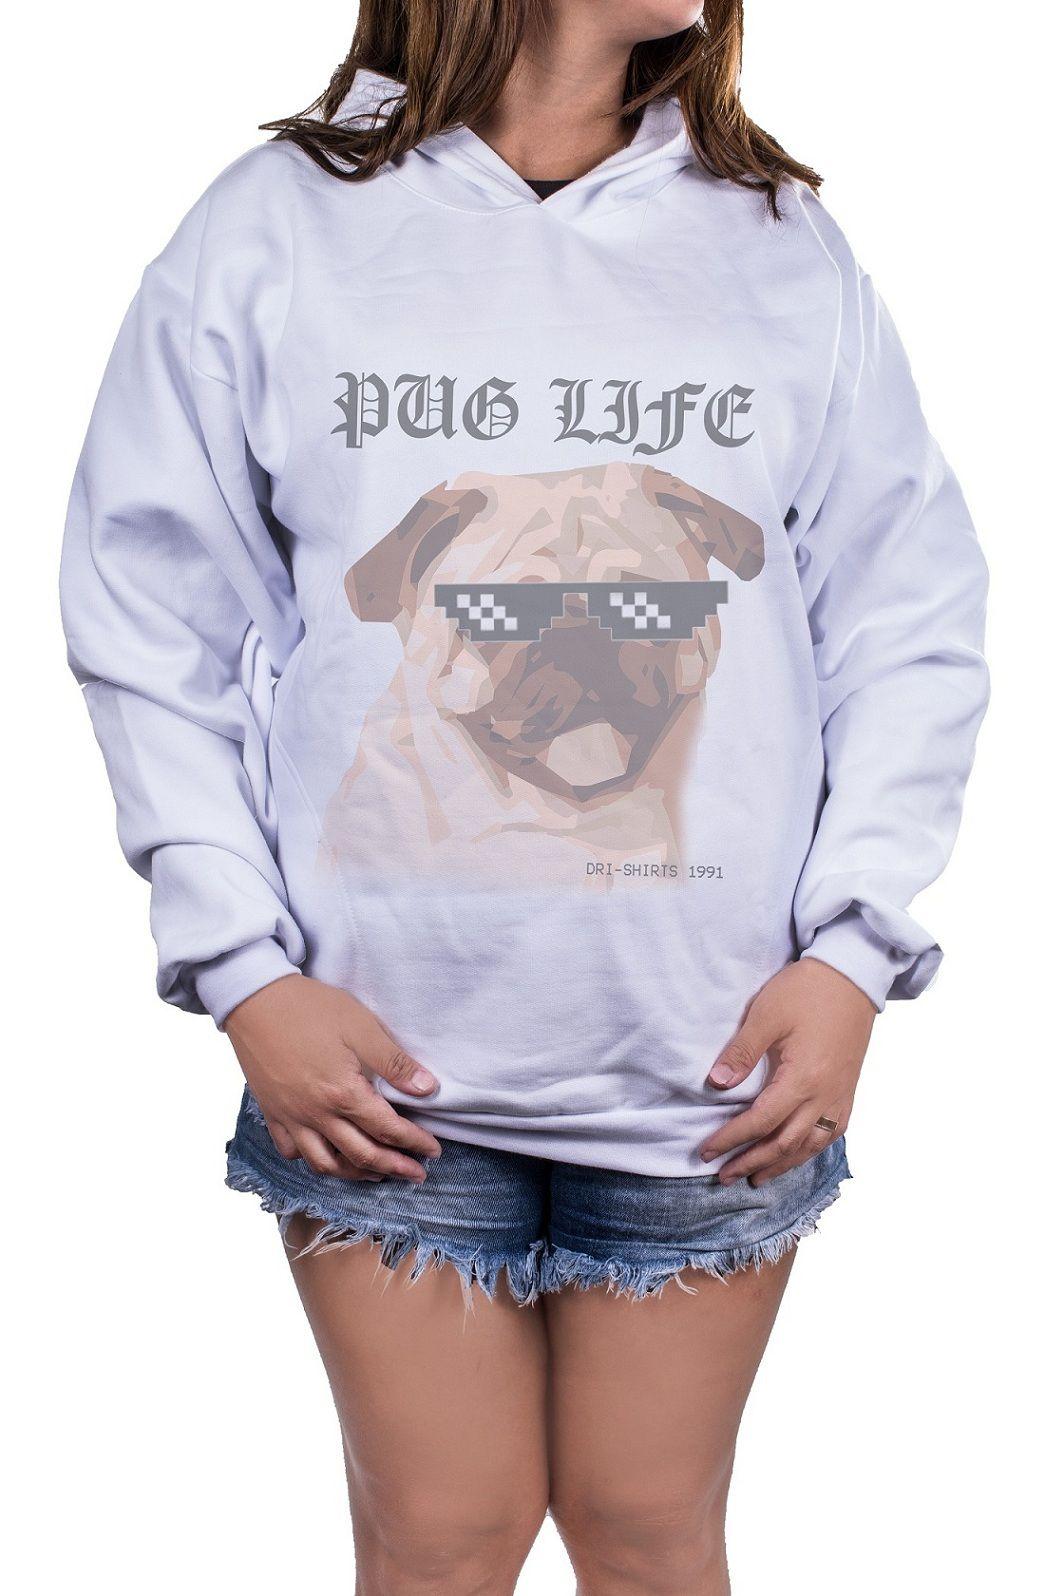 Blusa Feminina Moletom Estampada Estampa Pug Life